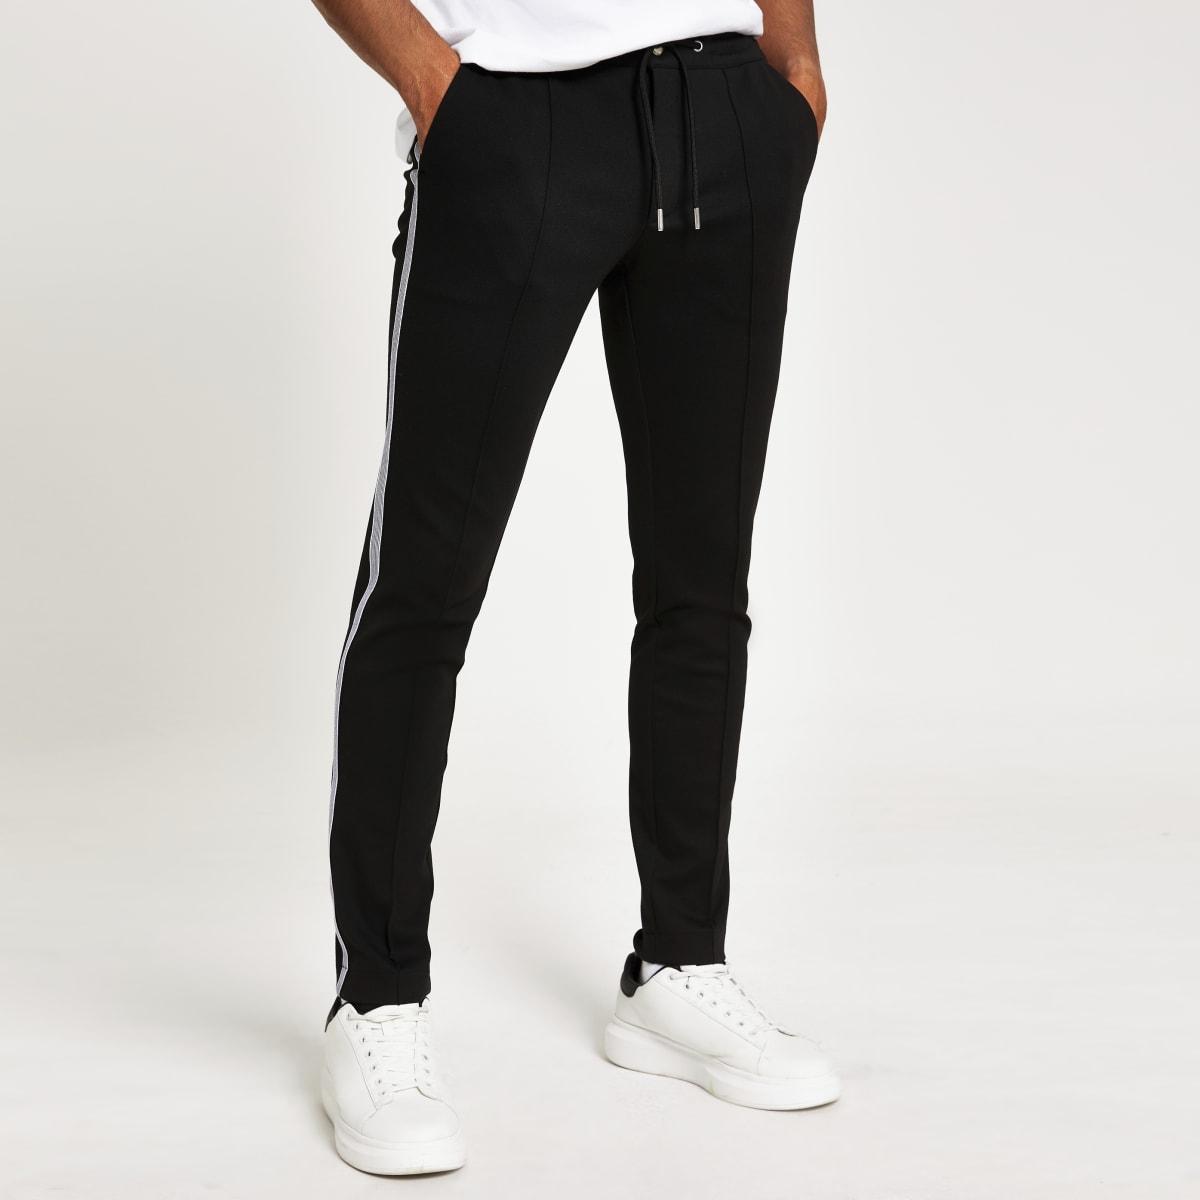 Zwarte superskinny nette joggingbroek